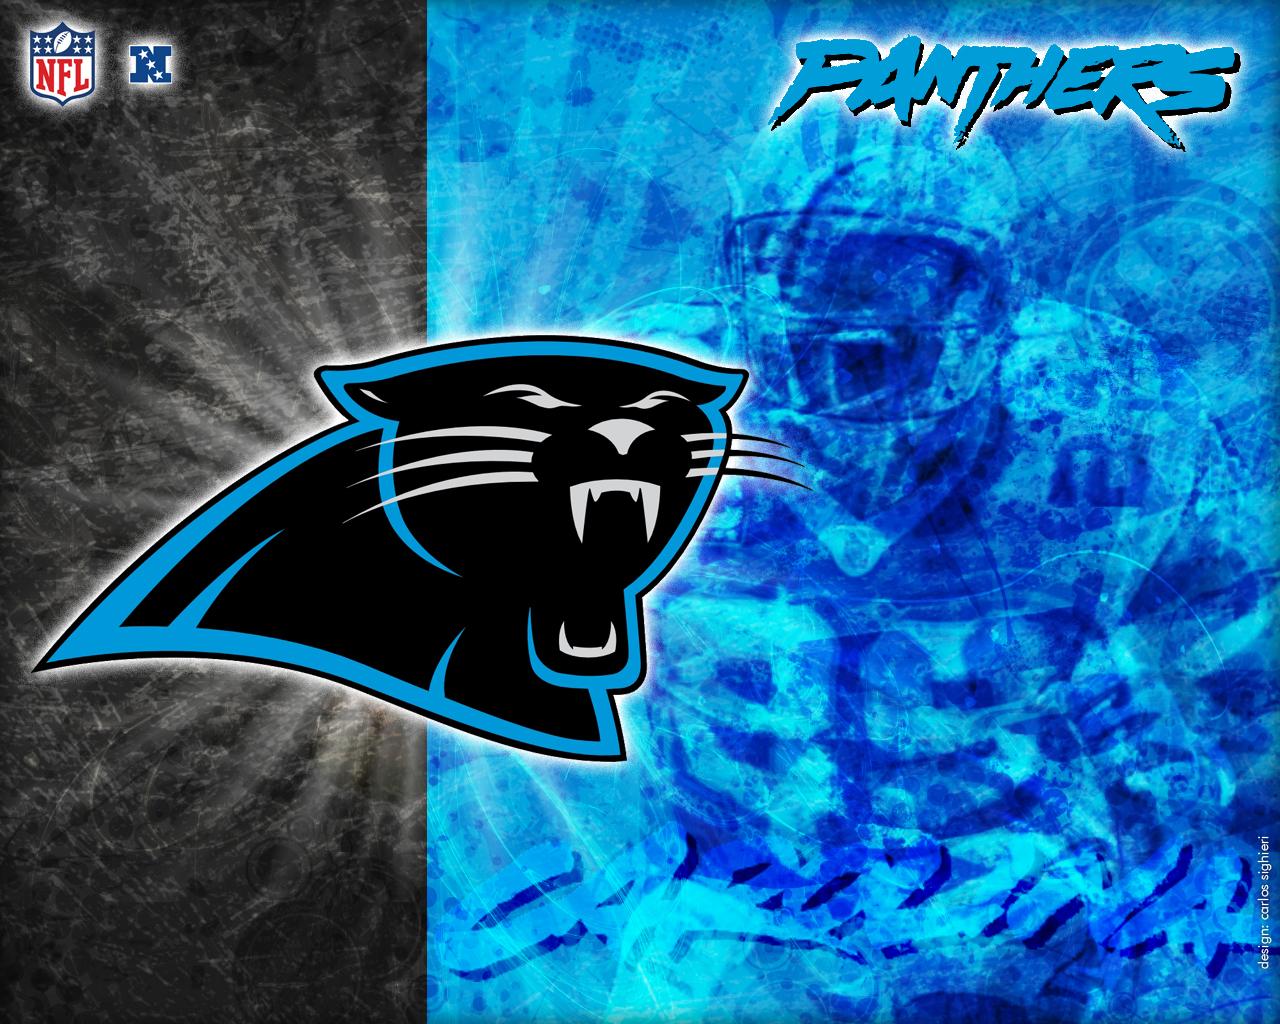 Hd Wallpapers Carolina Panthers Desktop 1920 X 1200 445 Kb Jpeg HD 1280x1024